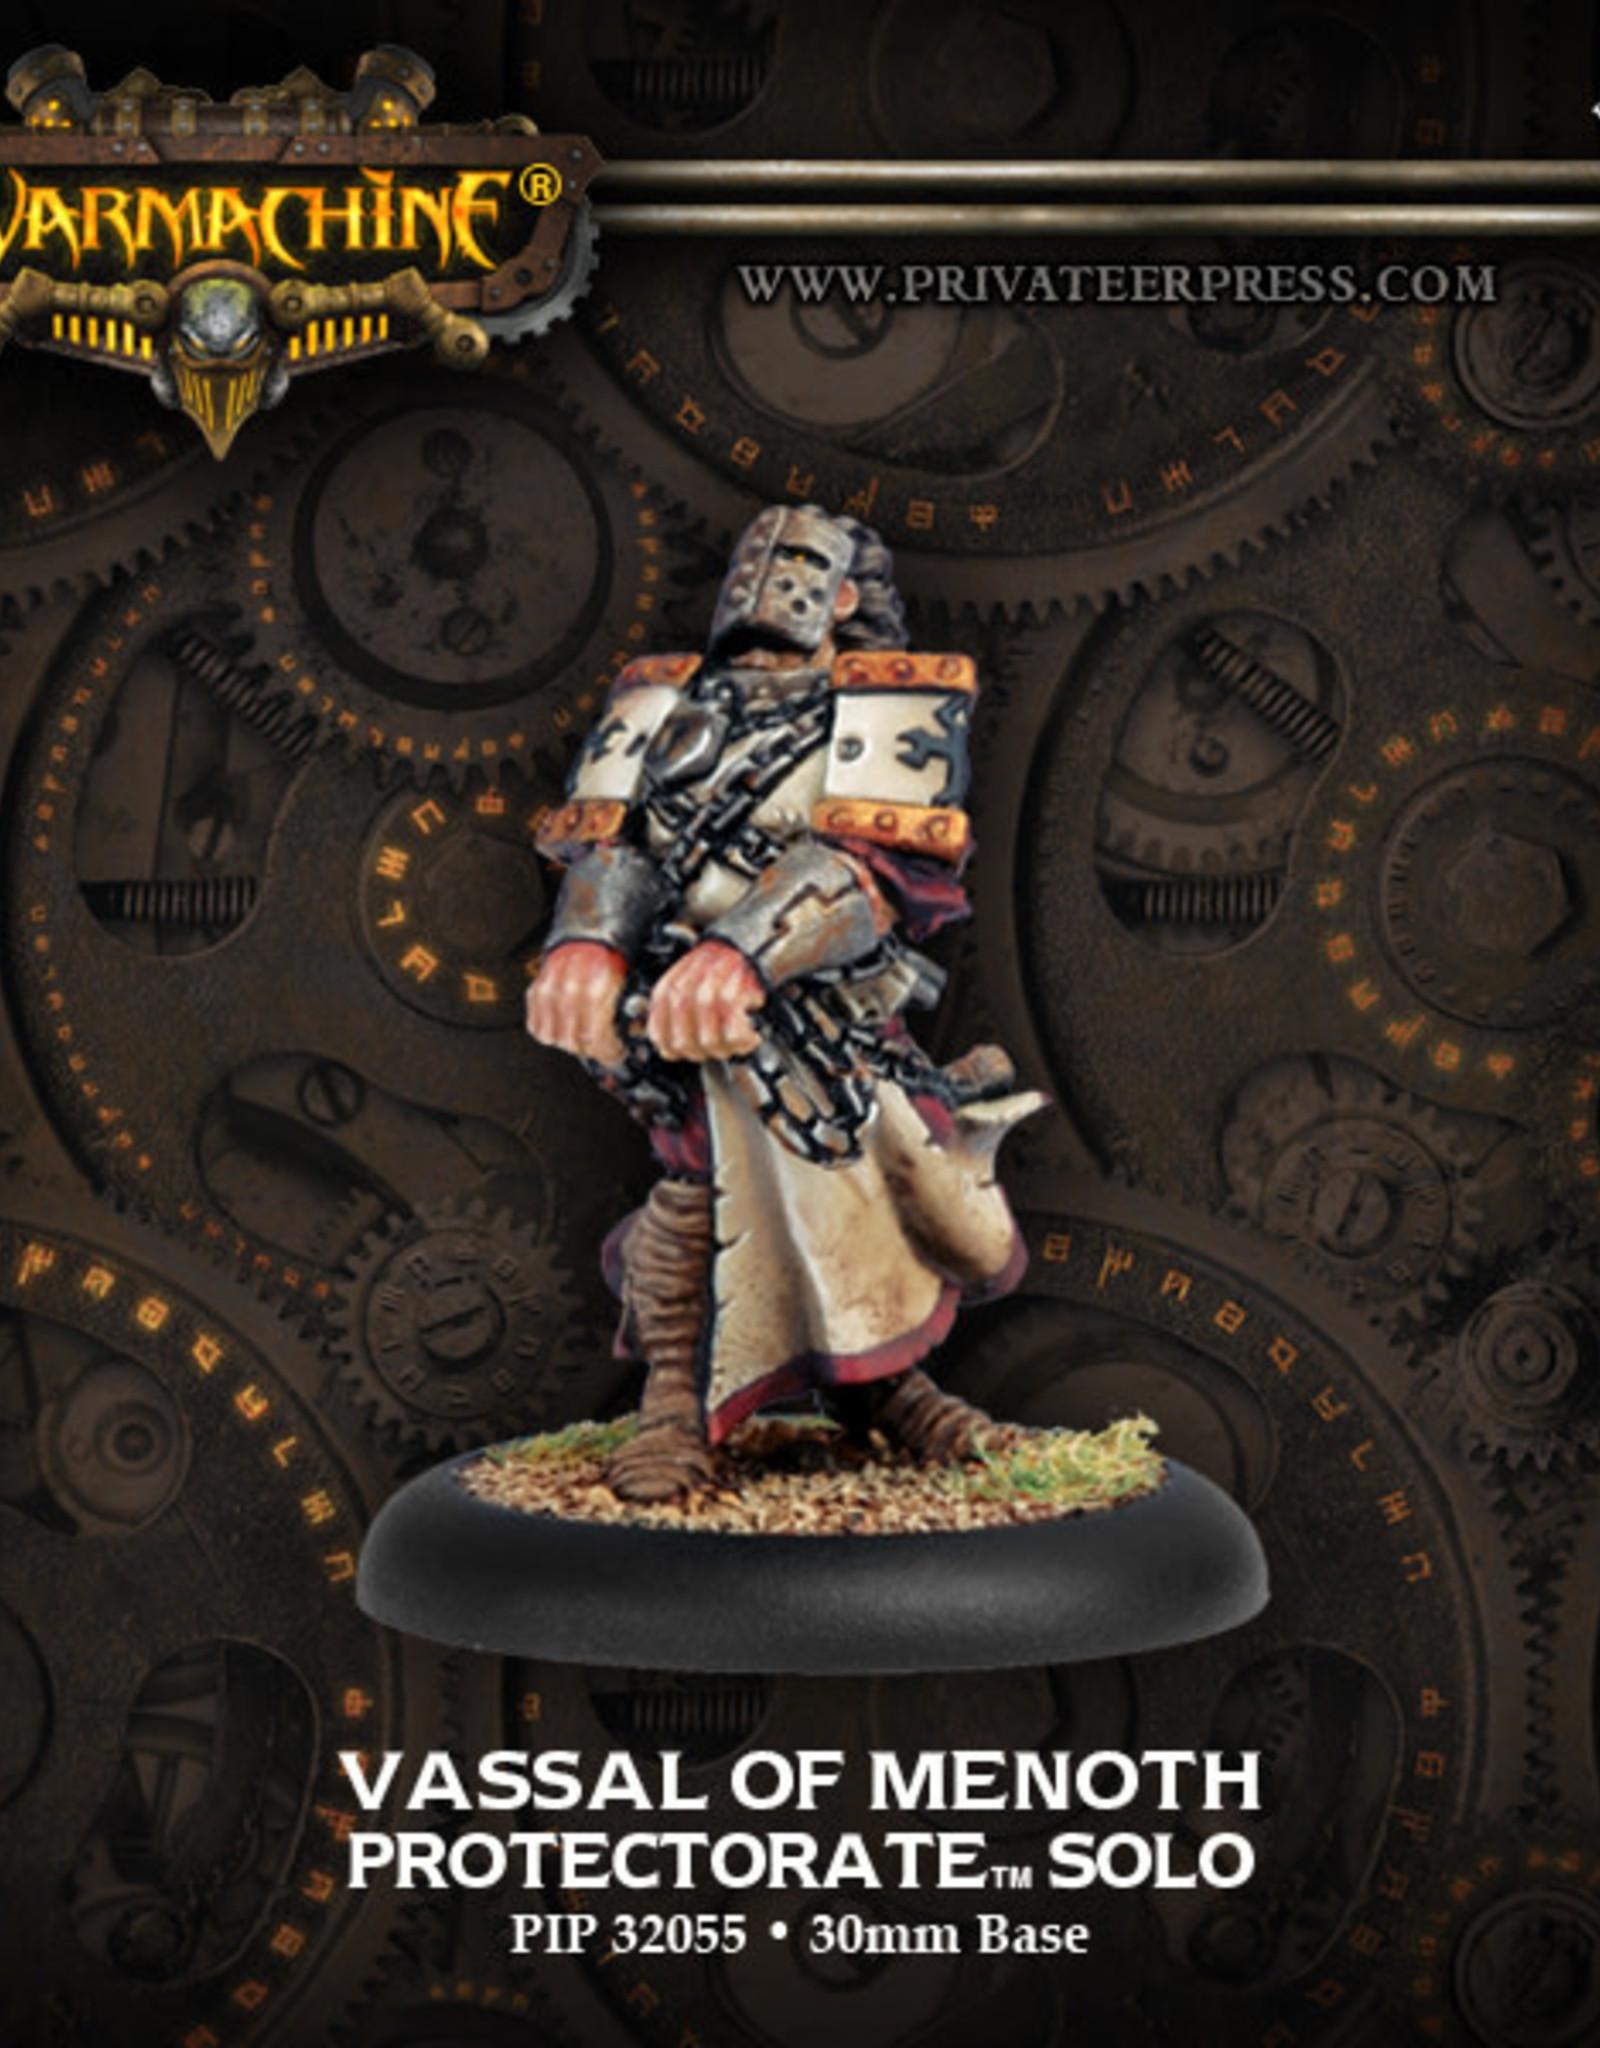 Warmachine Protectorate - Vassal of Menoth